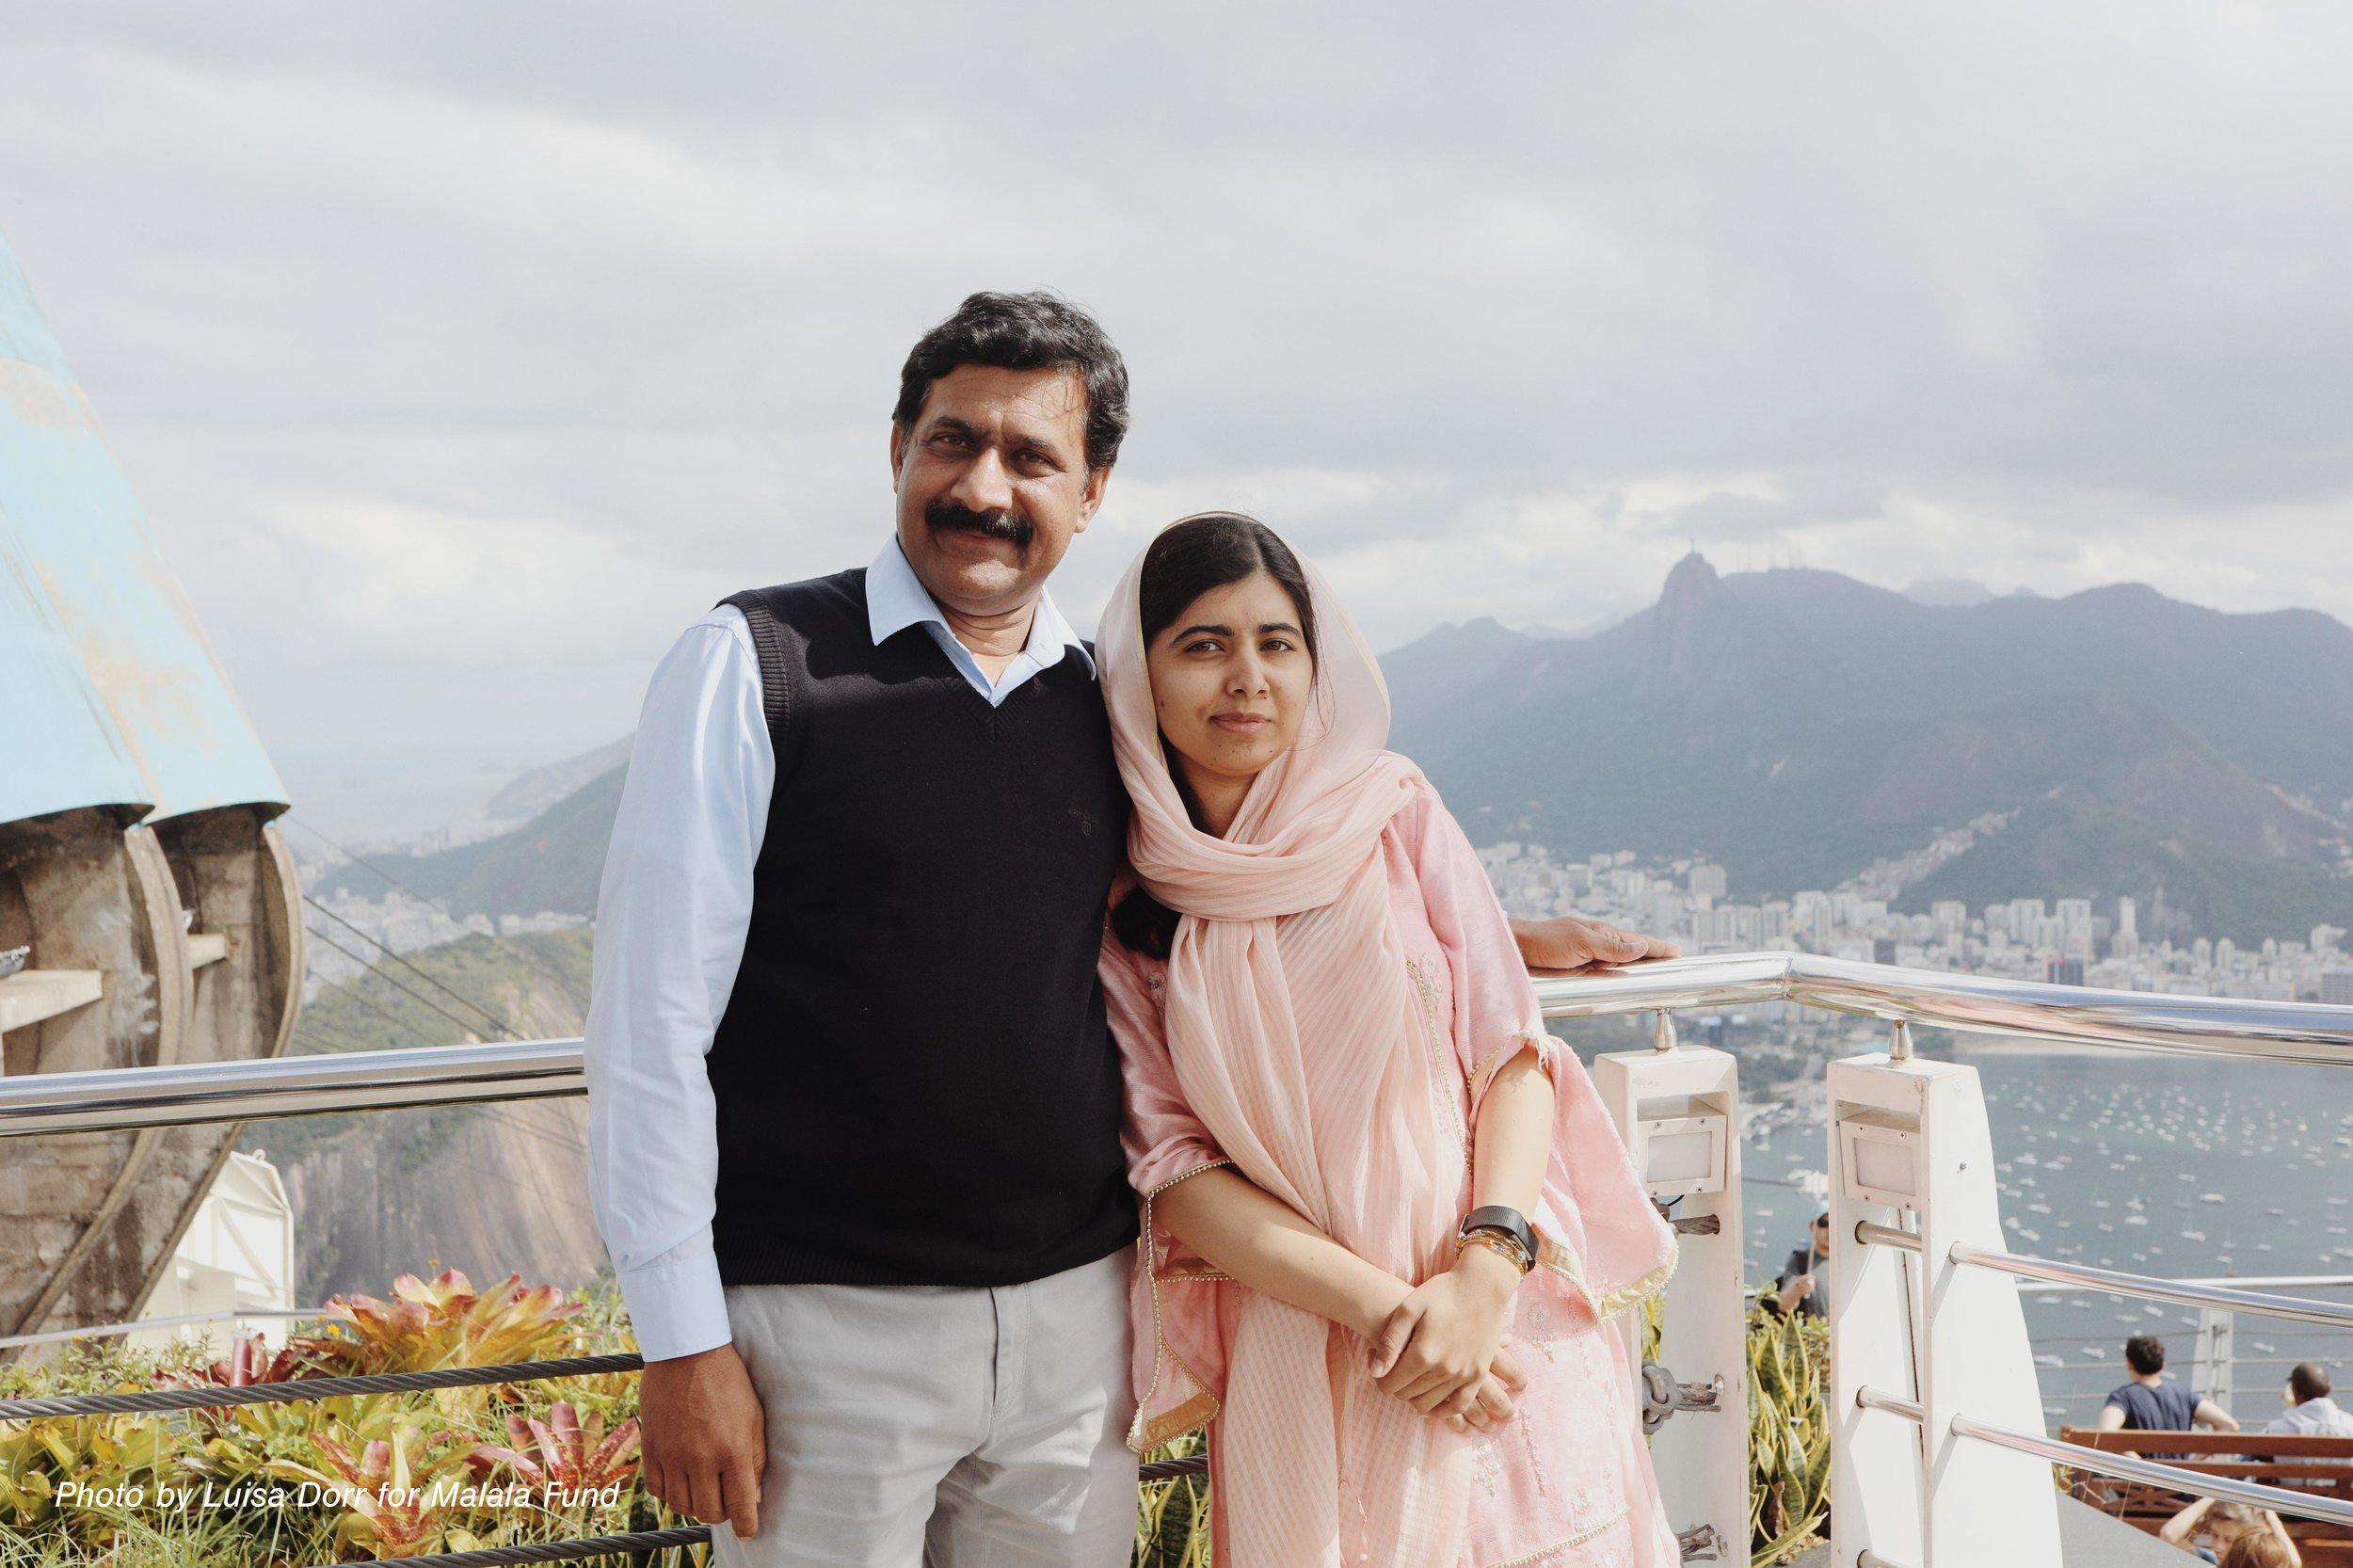 LD_Malala_169-01.jpg